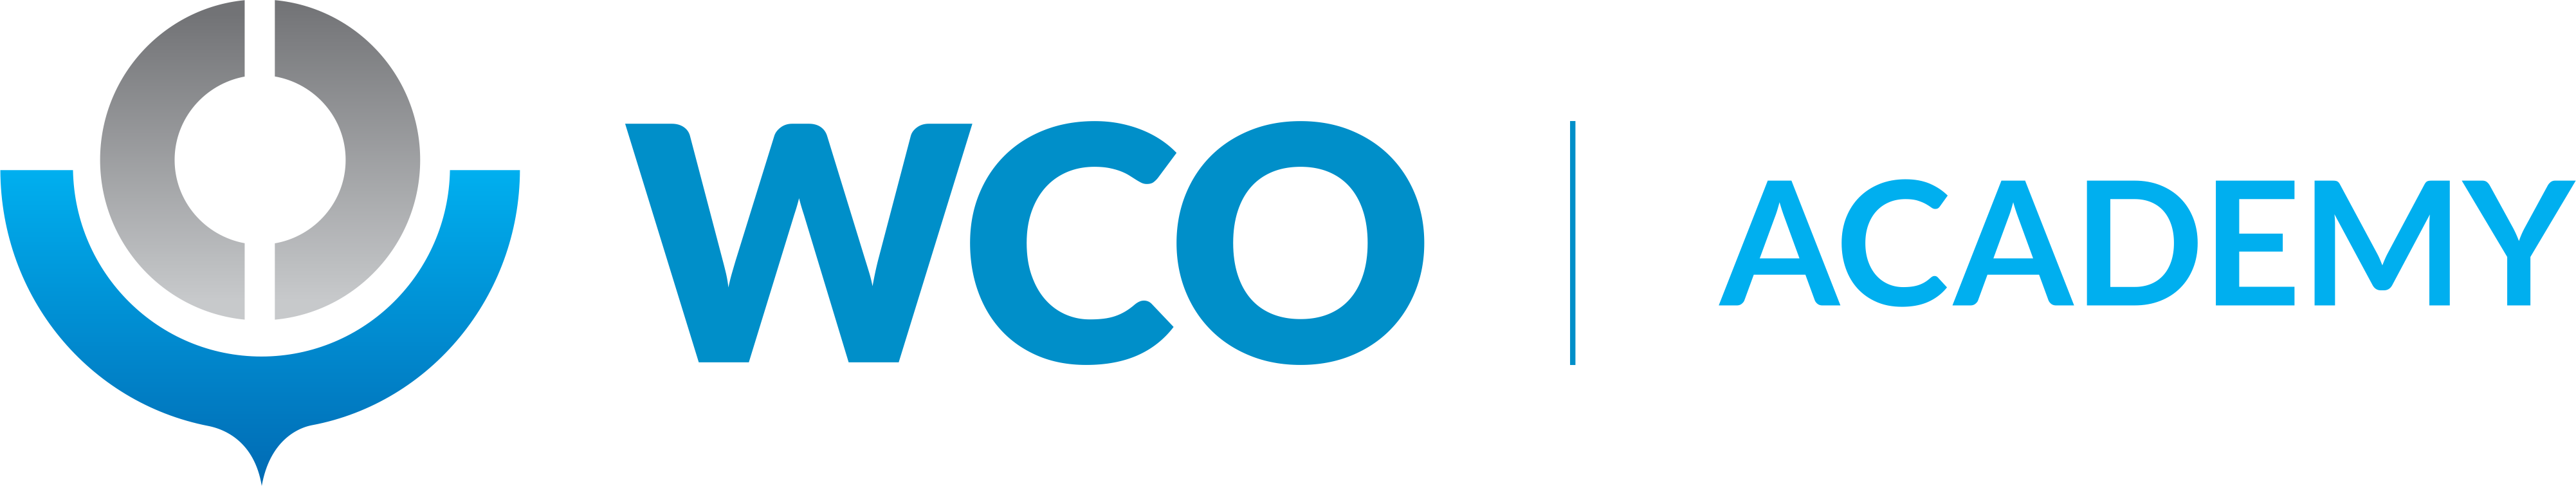 WCO Academy Logo